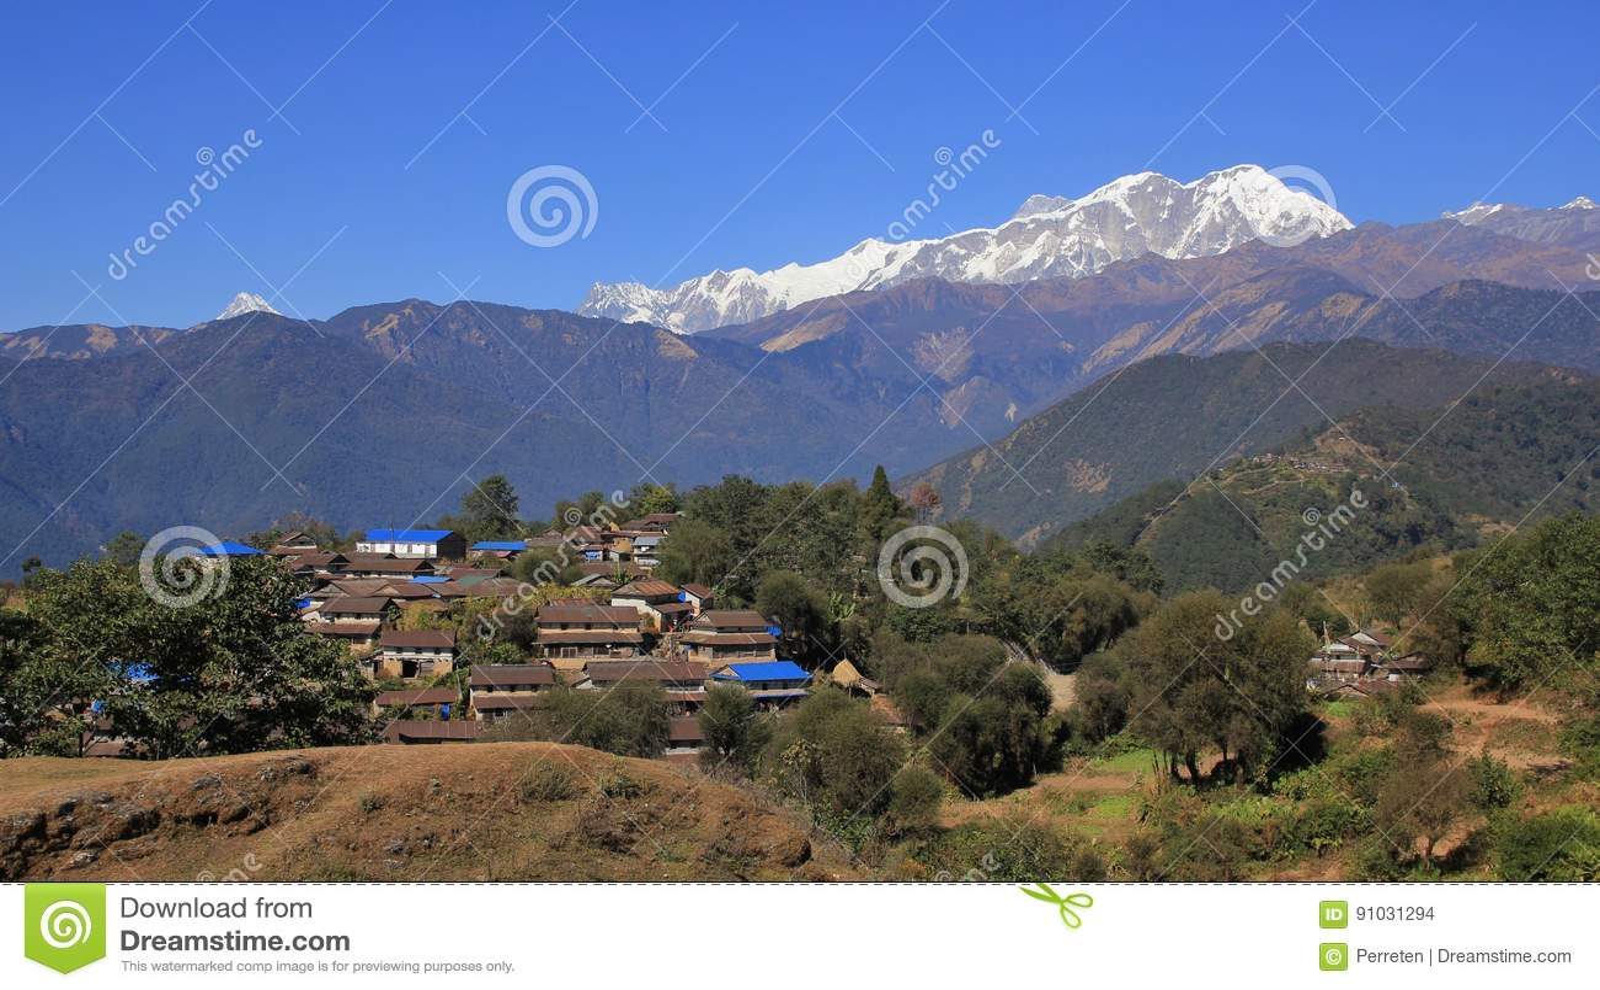 Gurung village Ghale Gaun and Annapurna range